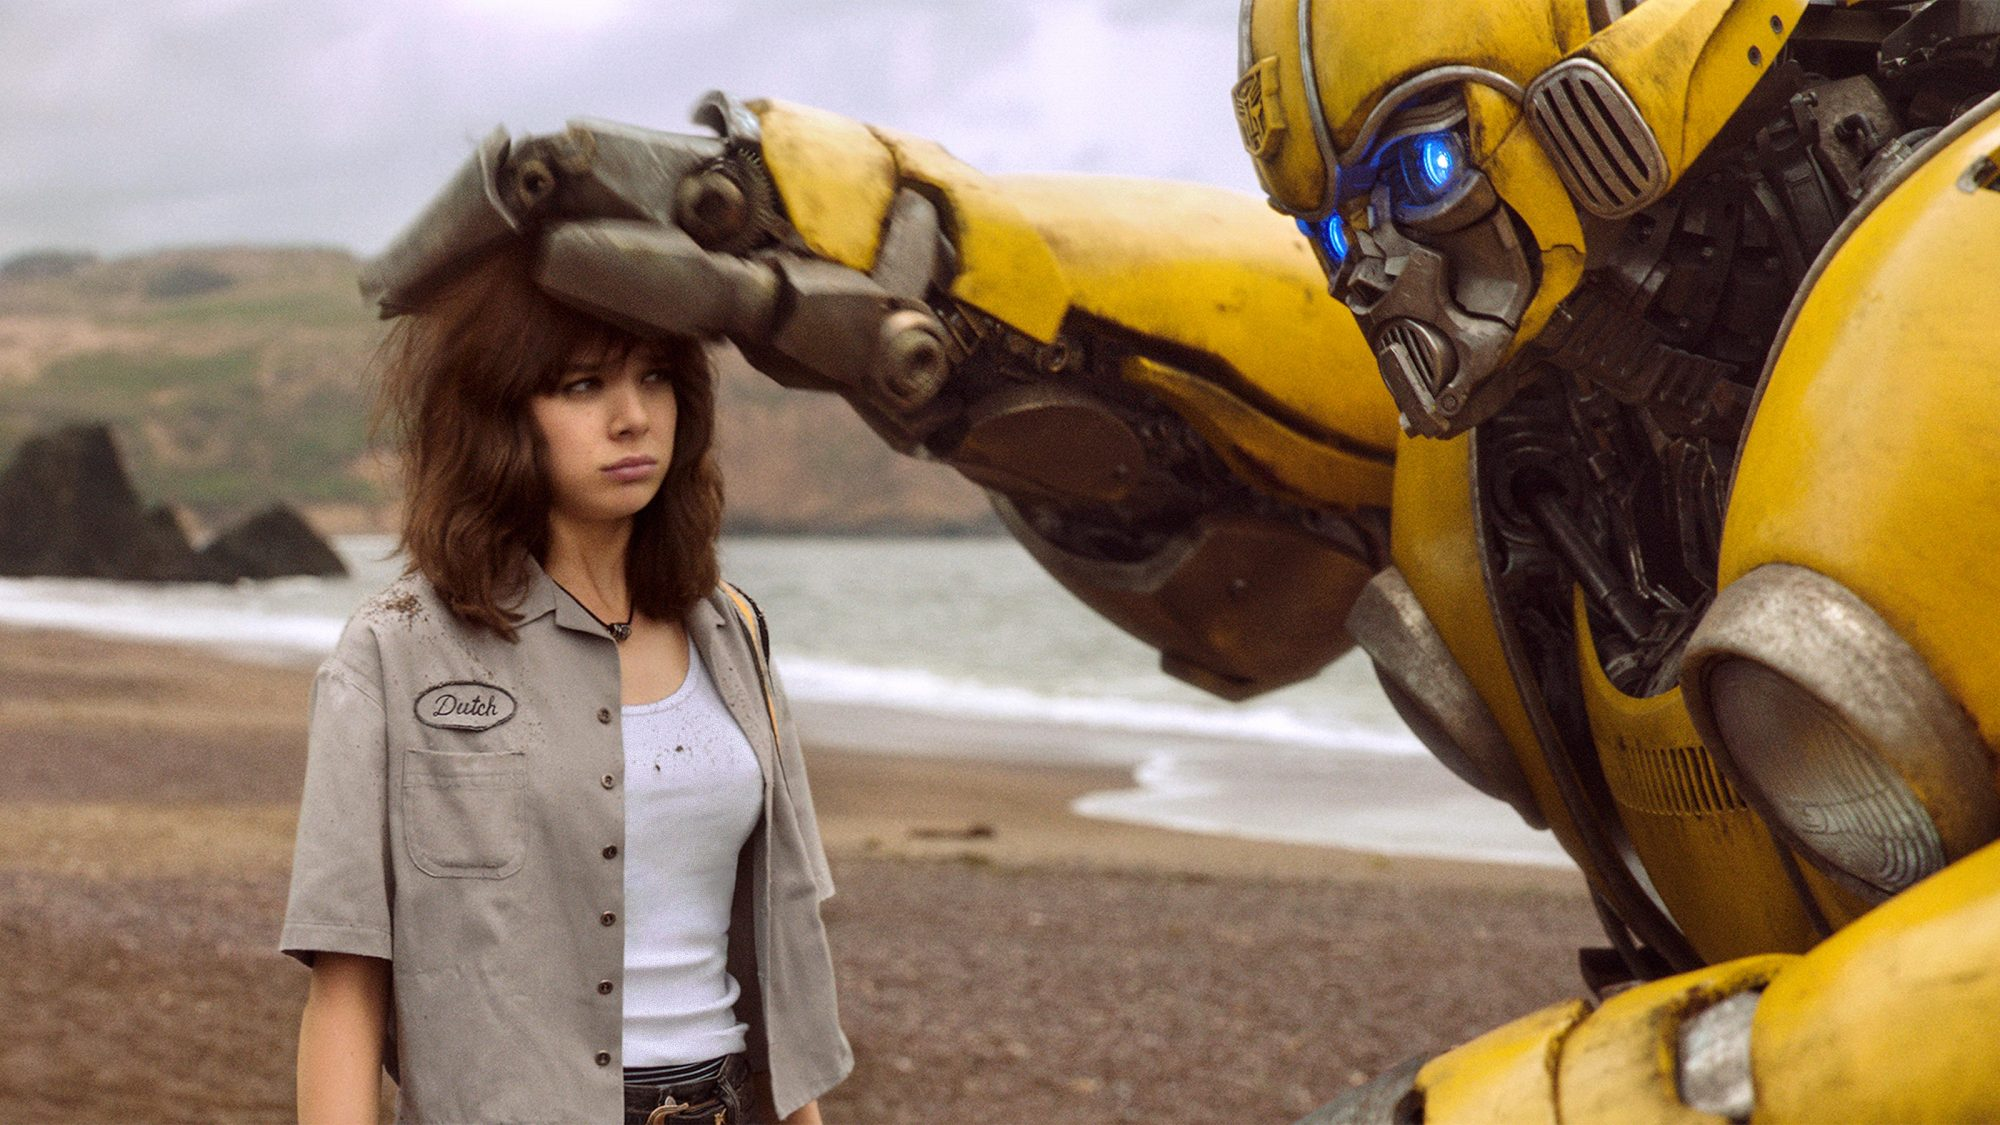 Bumblebee: 10 Best Movies to Stream on Hulu in June 2021